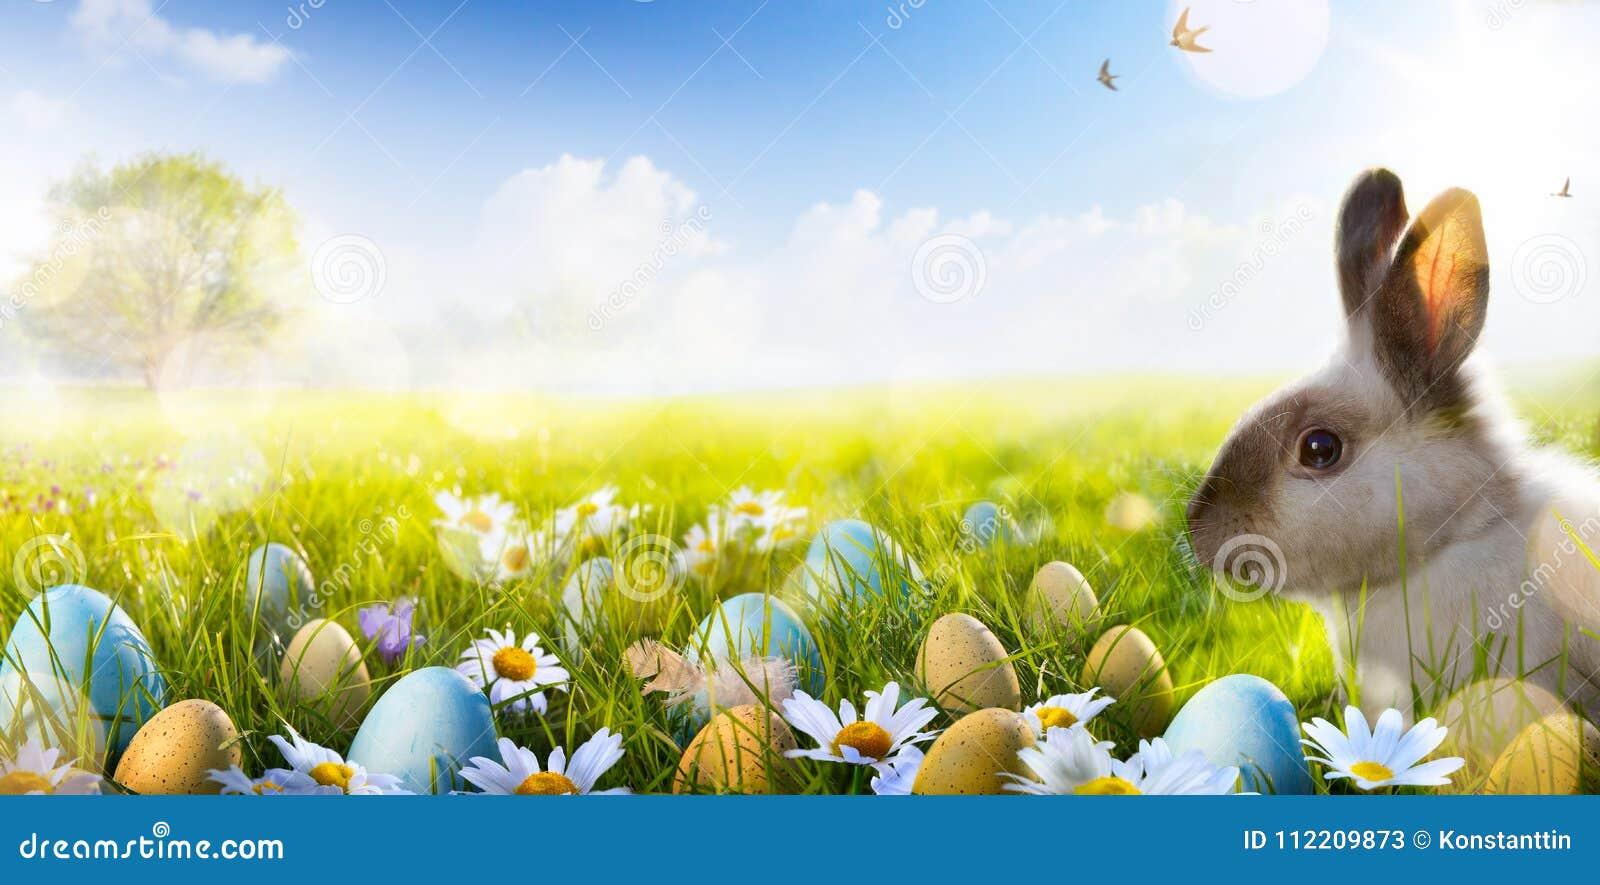 Art Easter bunny, Easter eggs and spring flower